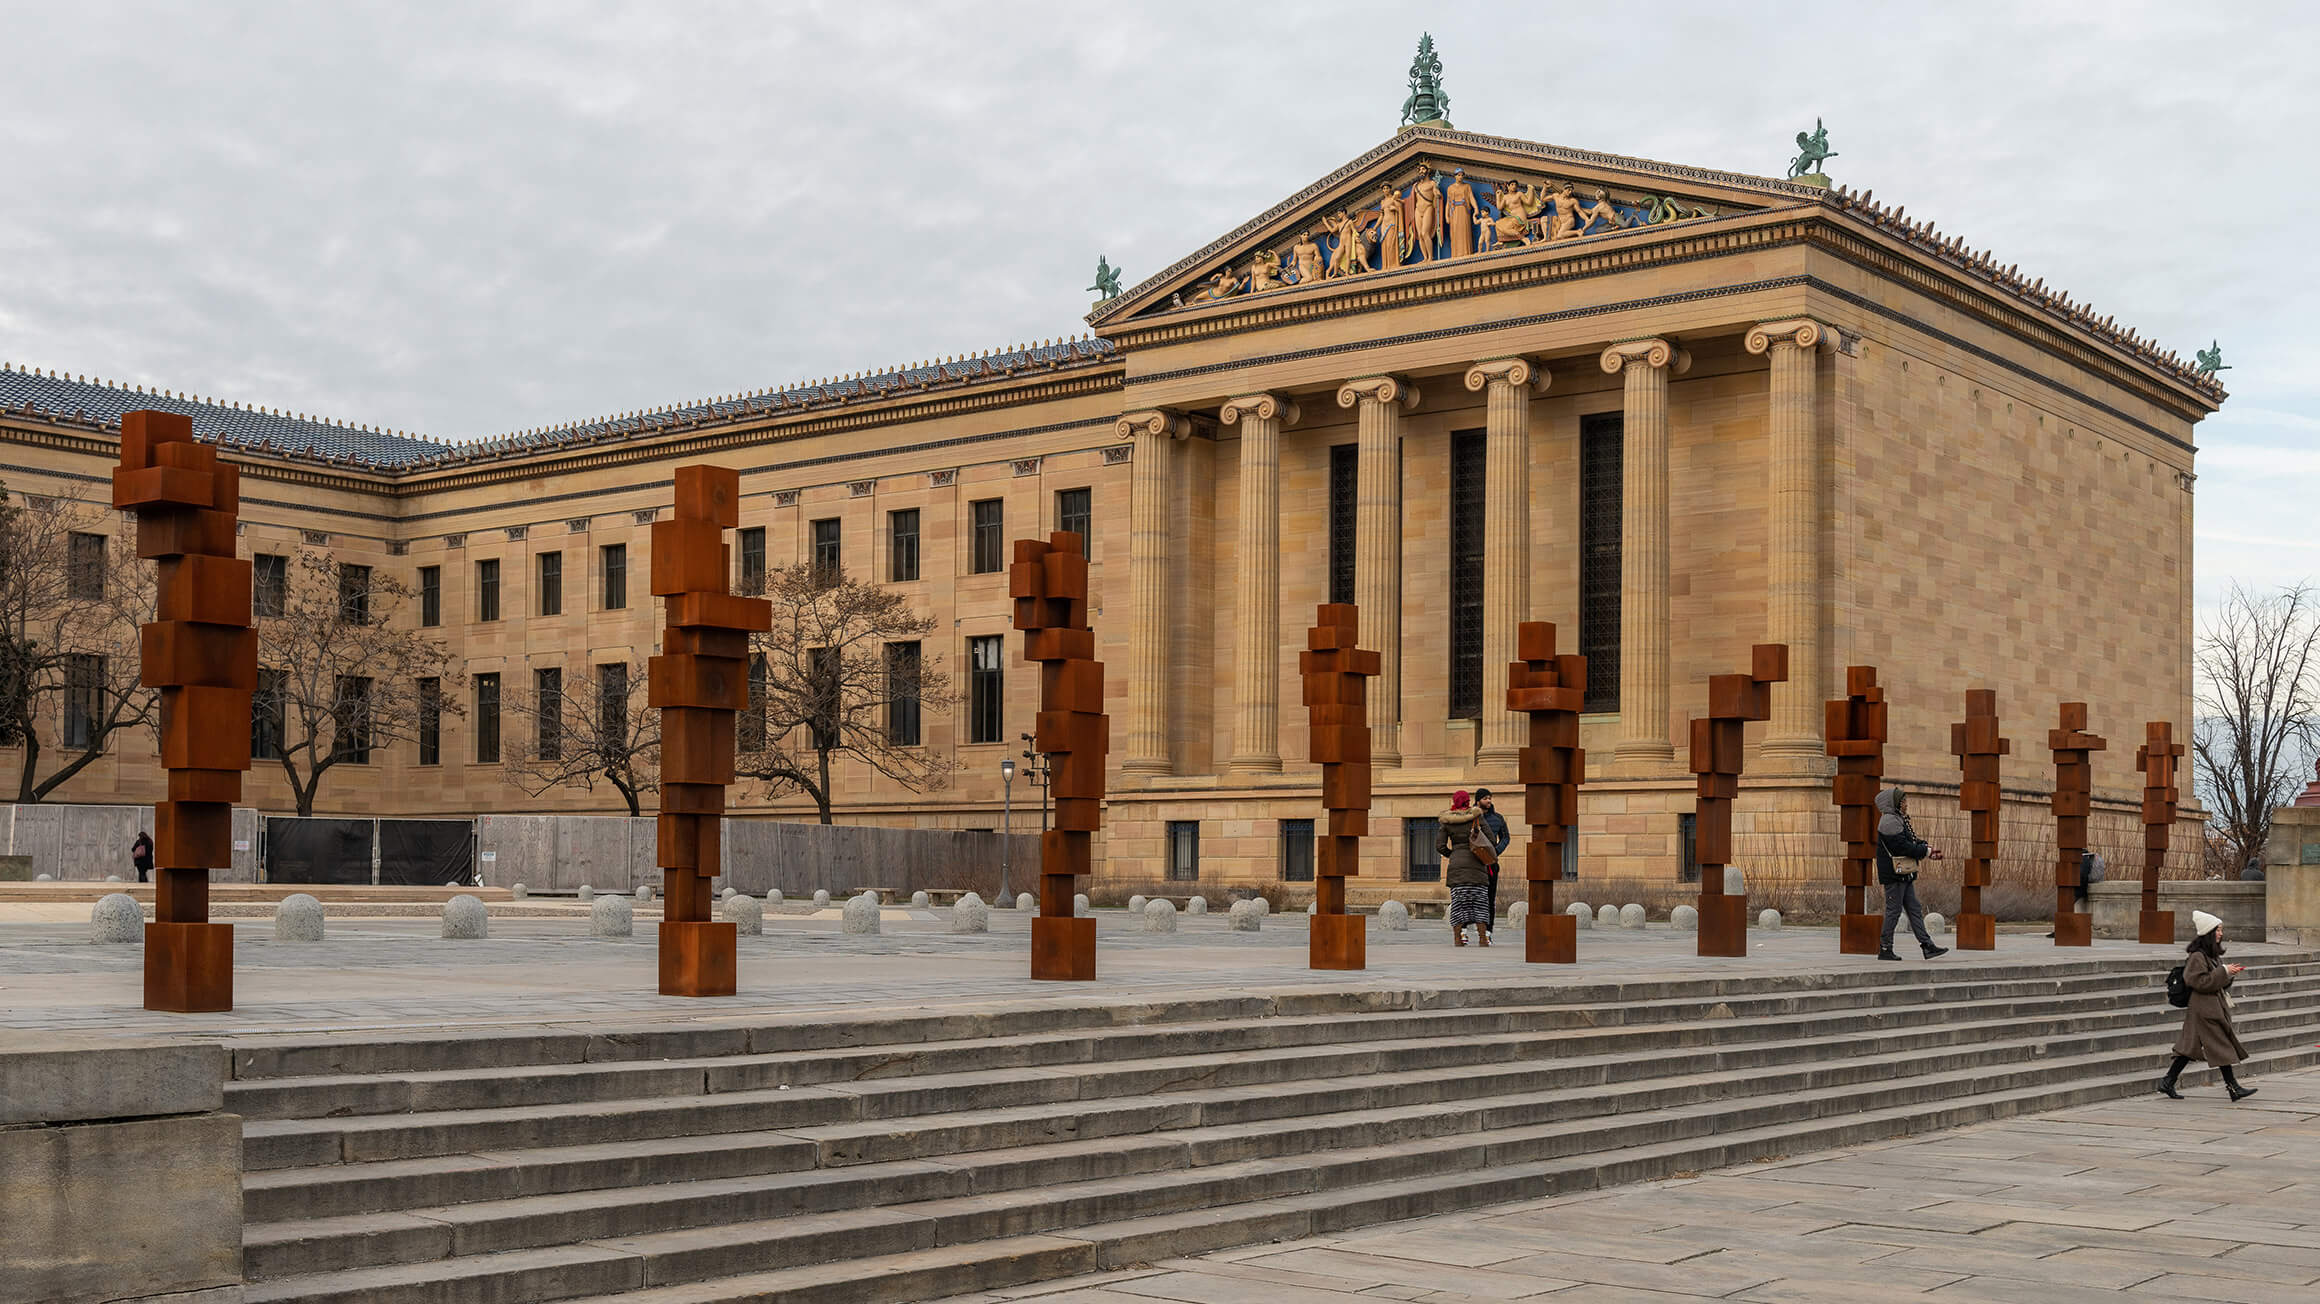 Antony Gormley: STAND, 2019, installation view, Philadelphia Museum of Art (Courtesy the artist and Sean Kelly Gallery) © Antony Gormley